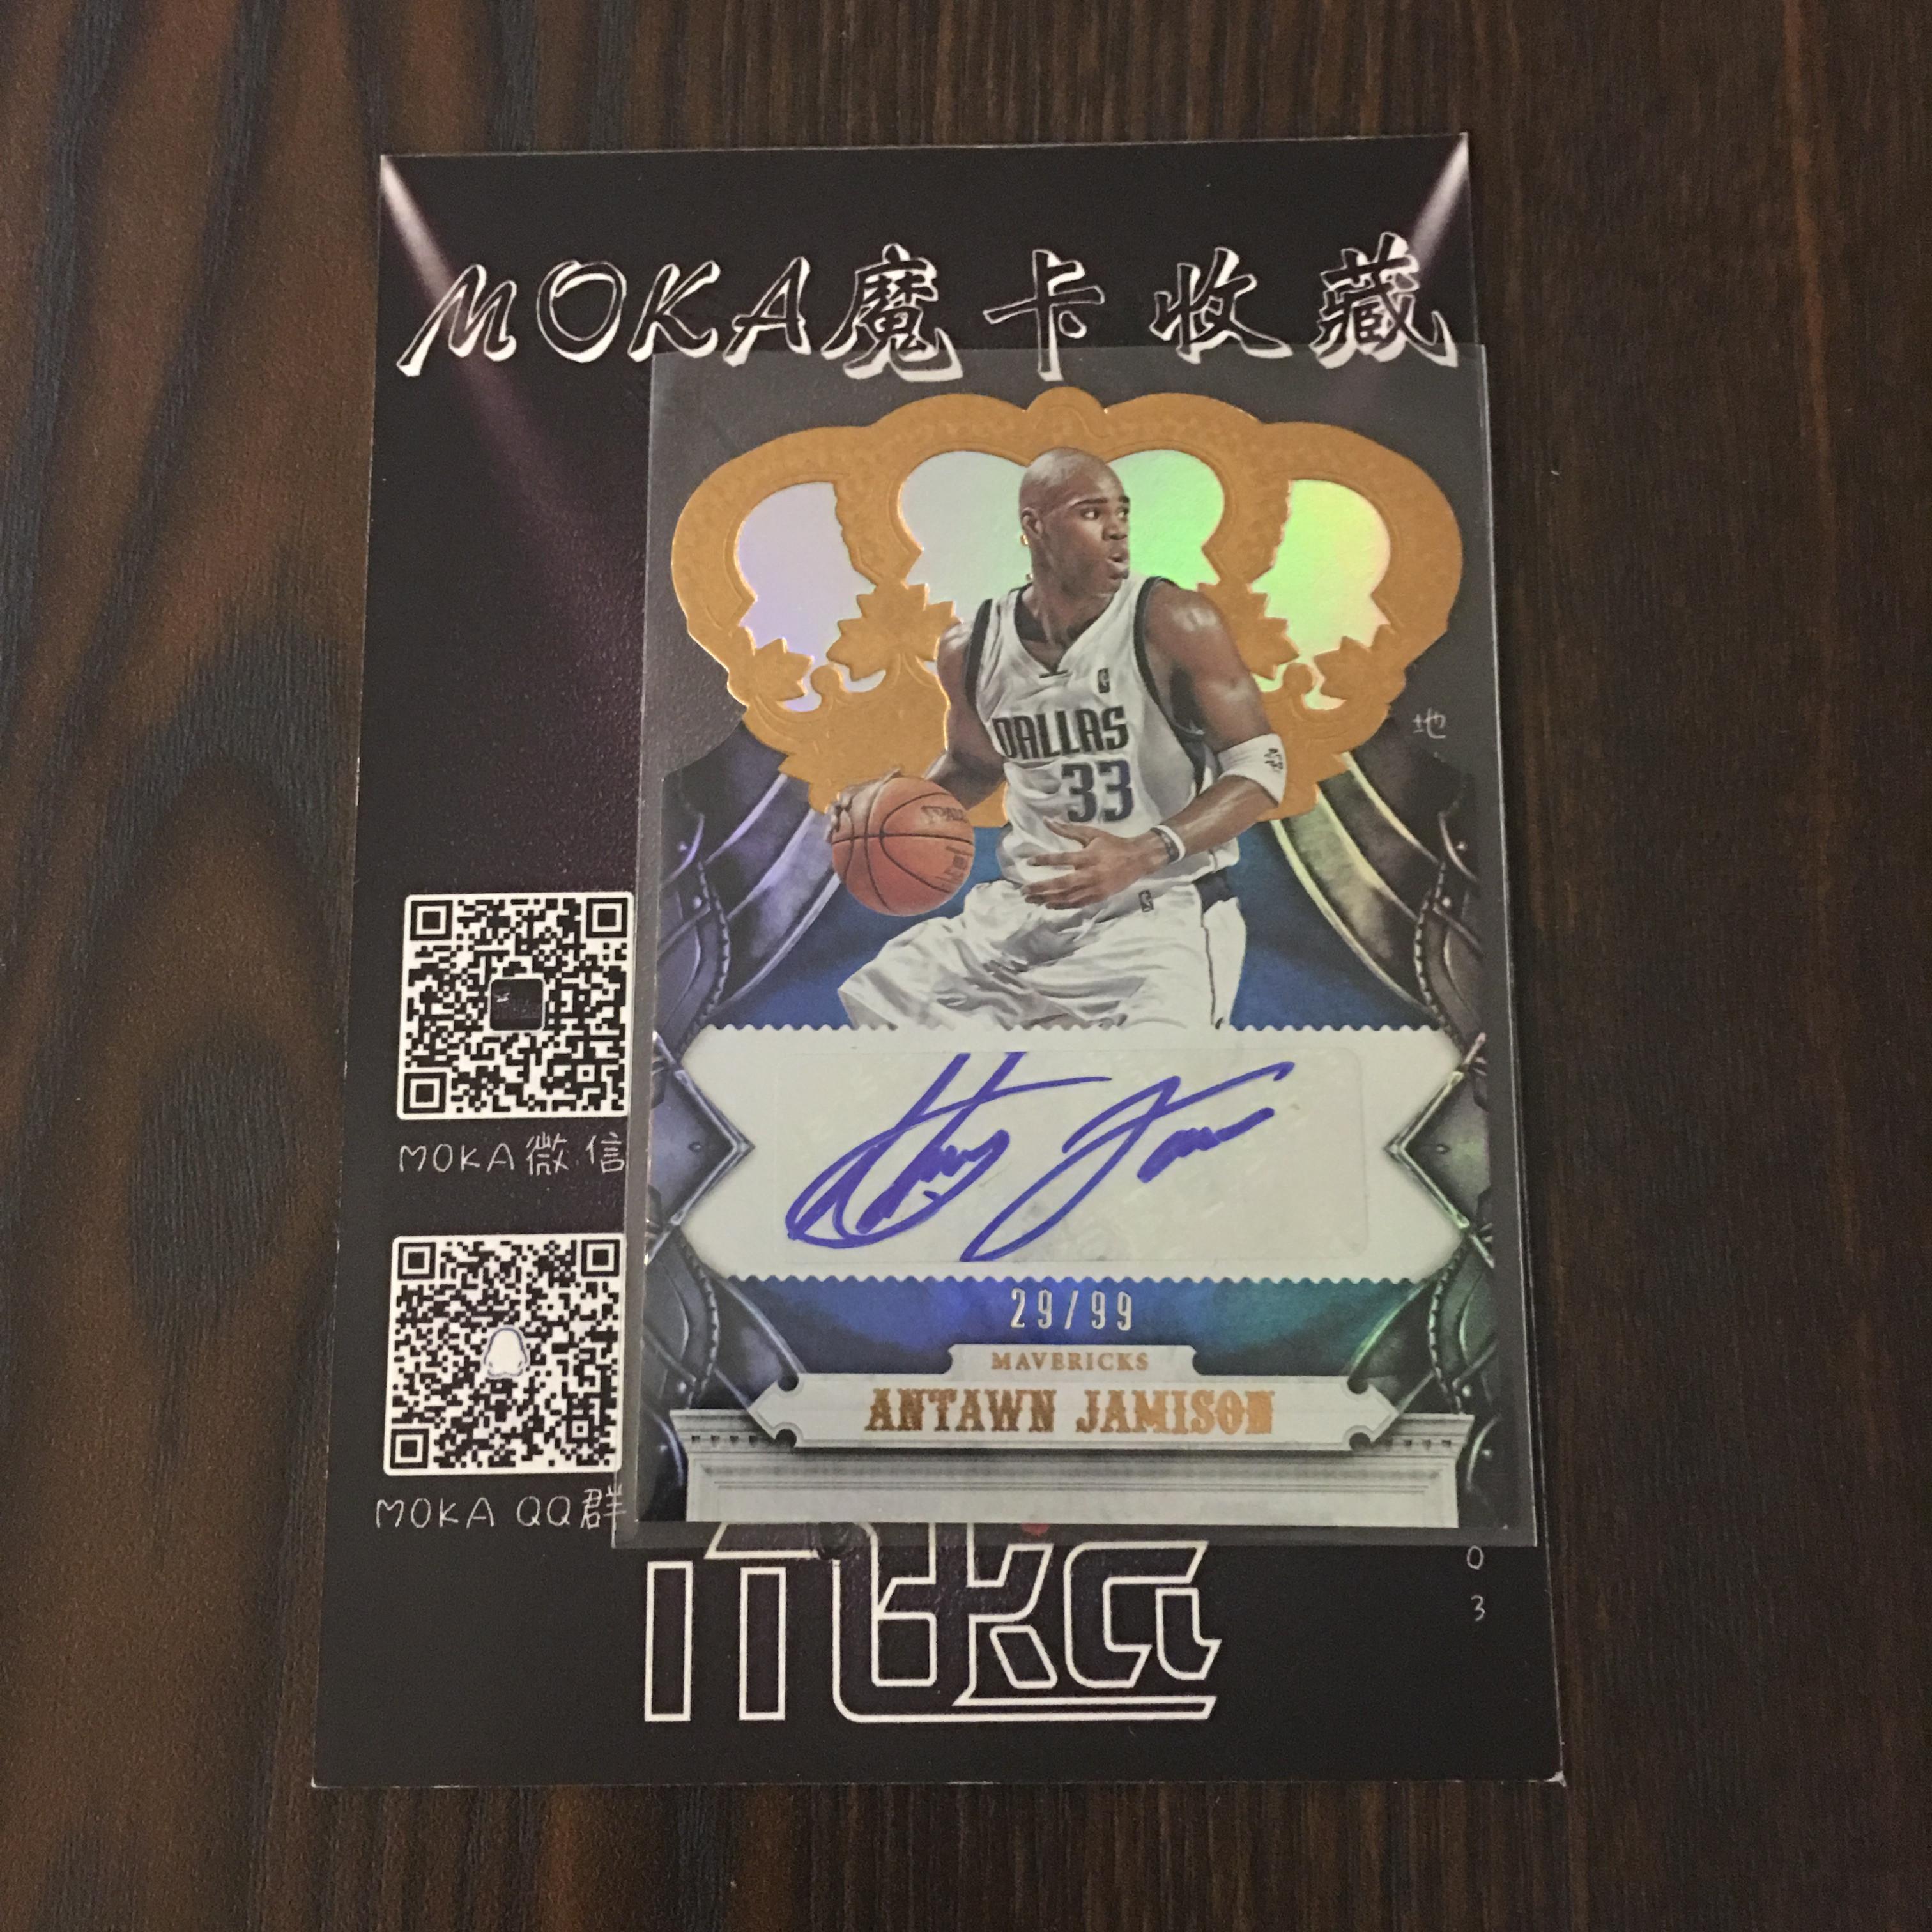 【MOKA球星卡收藏】#1804483 2017-18 Panini Crown 皇冠 小牛 独行侠 贾米森 签字 /99编